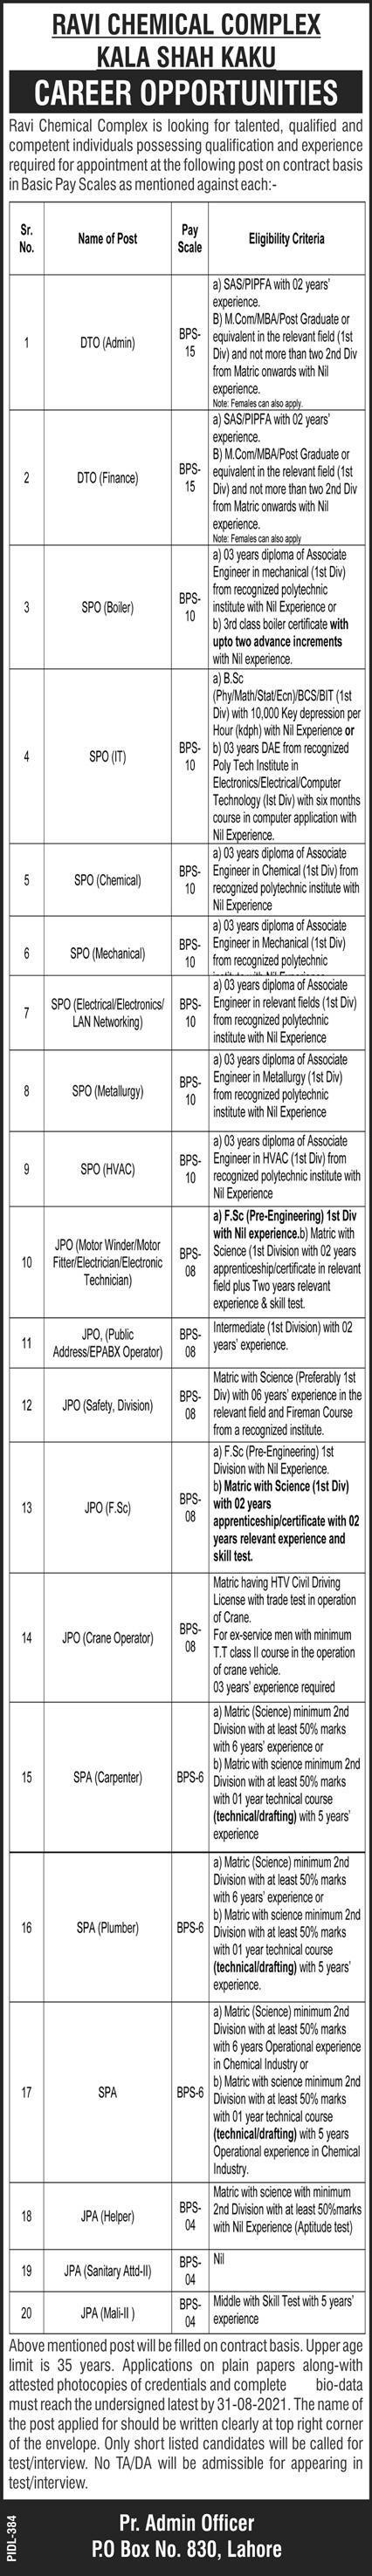 Ravi Chemical Complex Jobs 2021 In Kala Shah Kaku